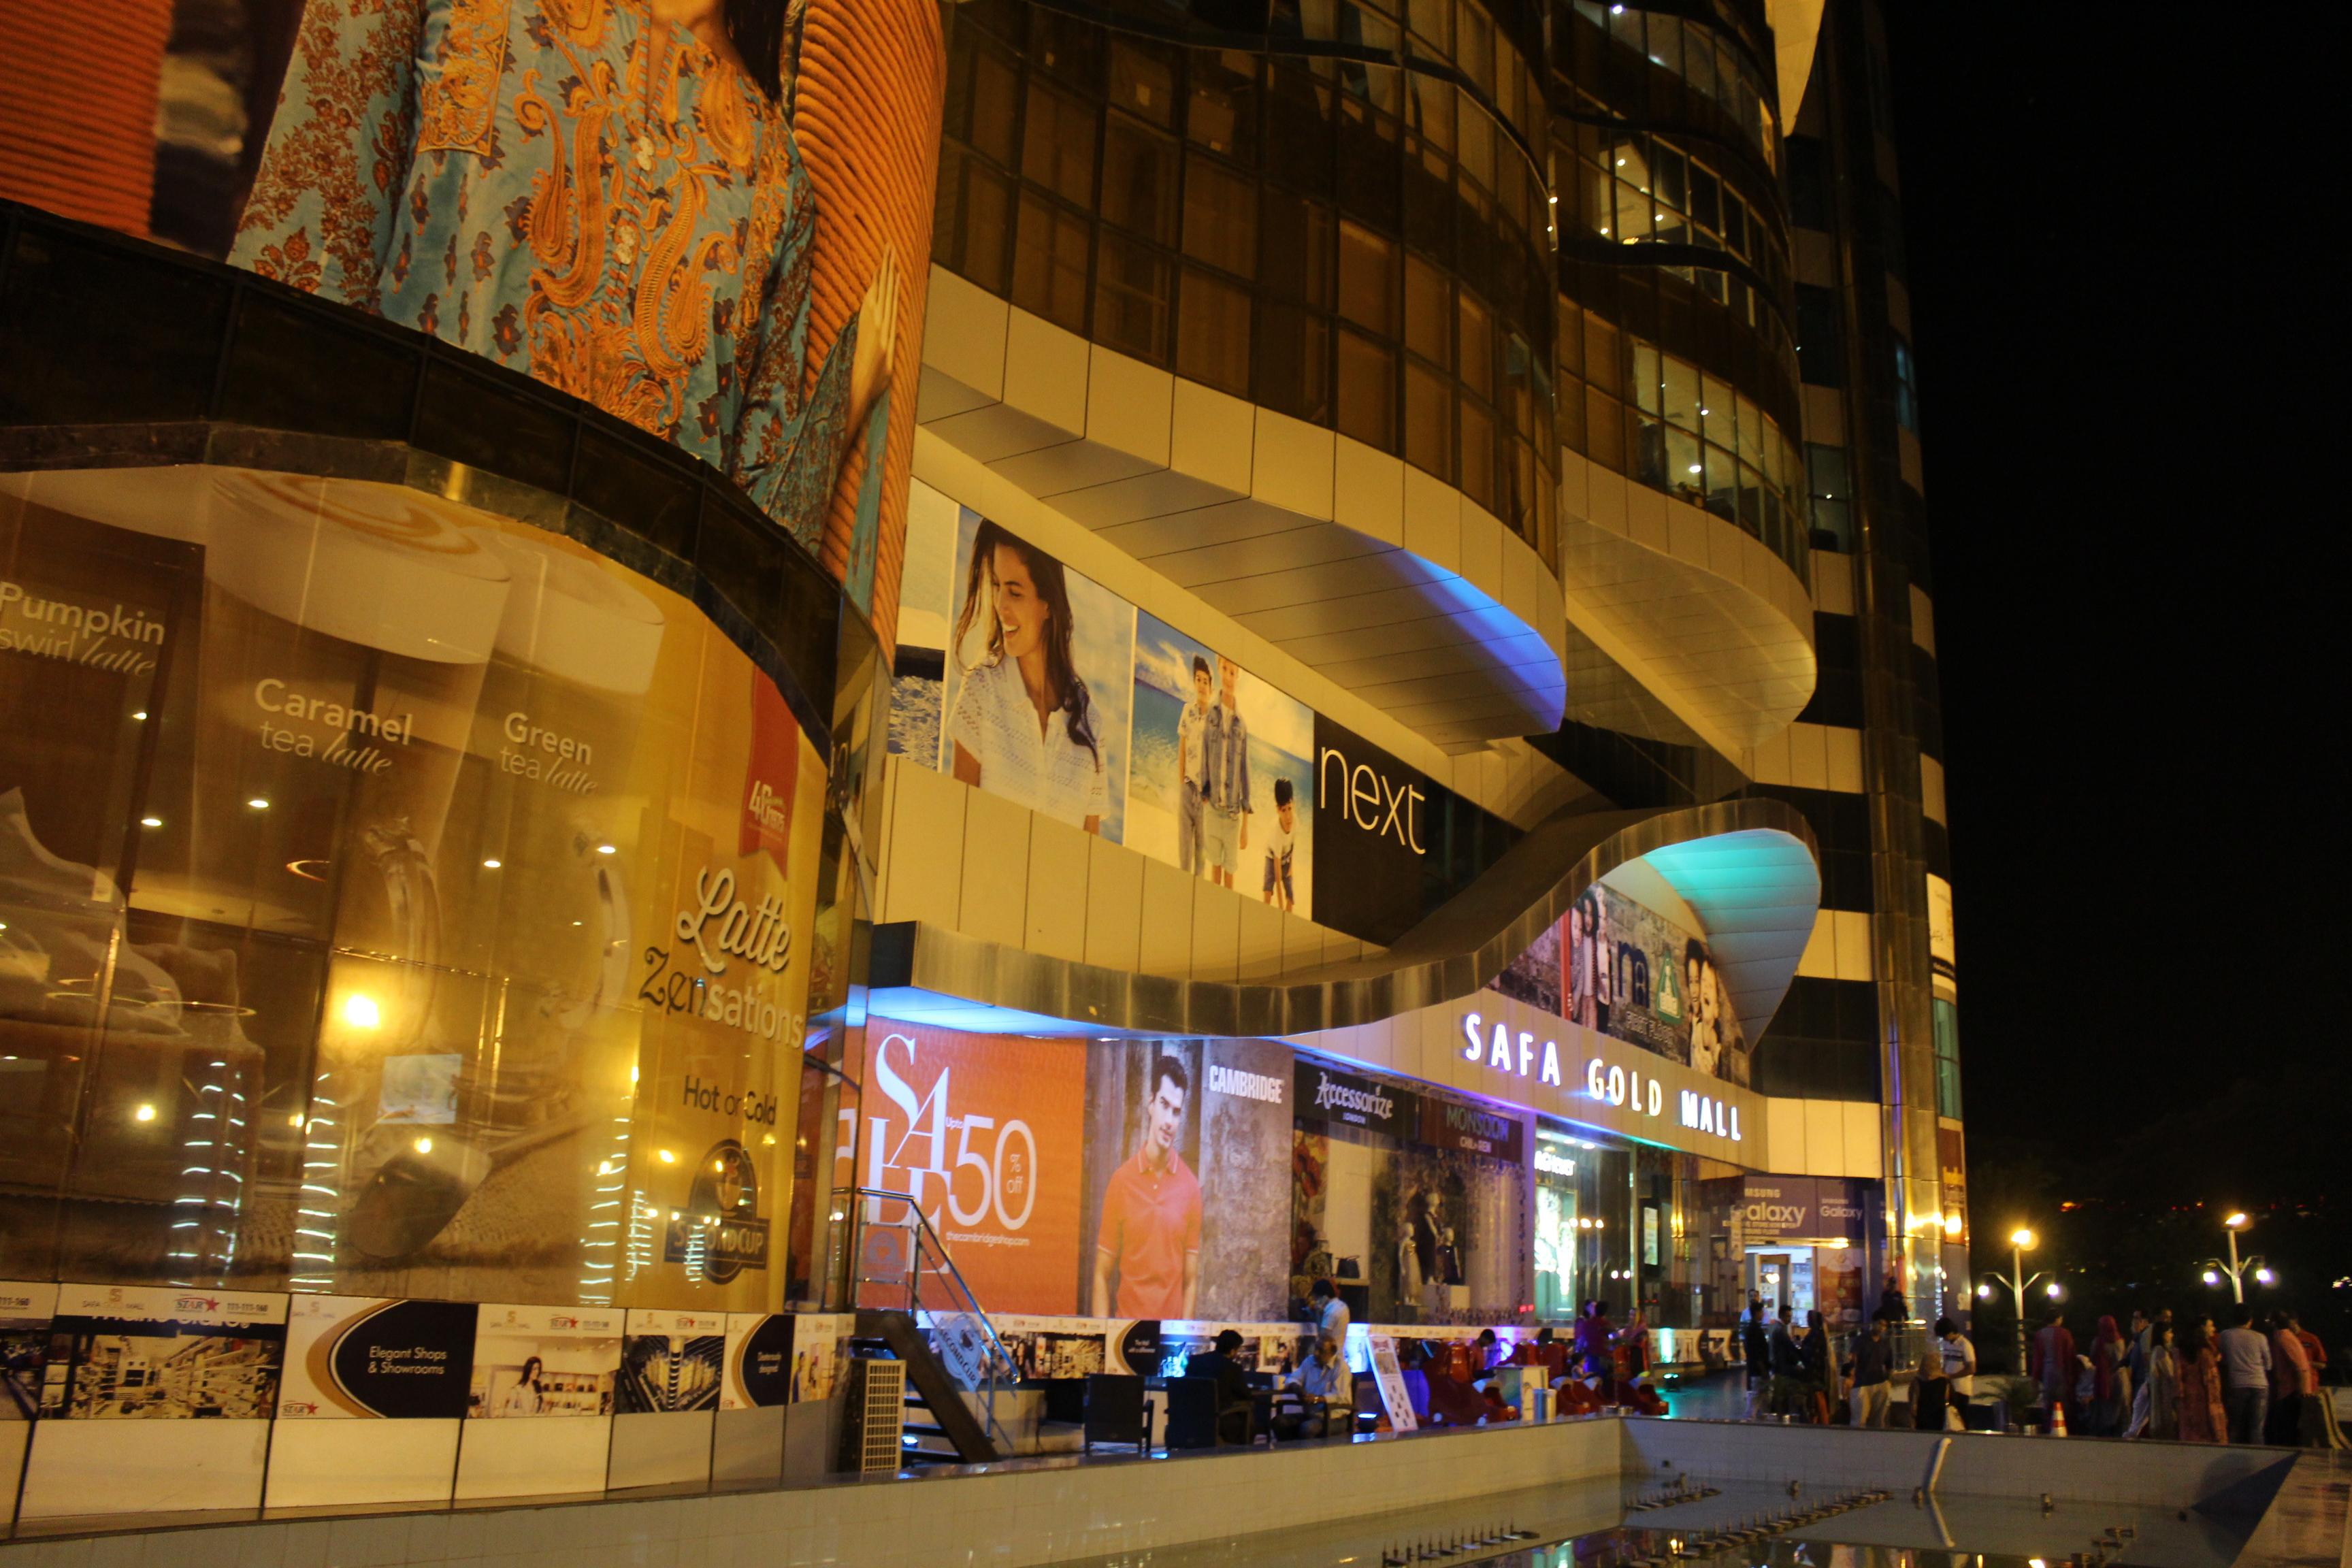 File:Safa Gold Mall.JPG - Wikimedia Commons